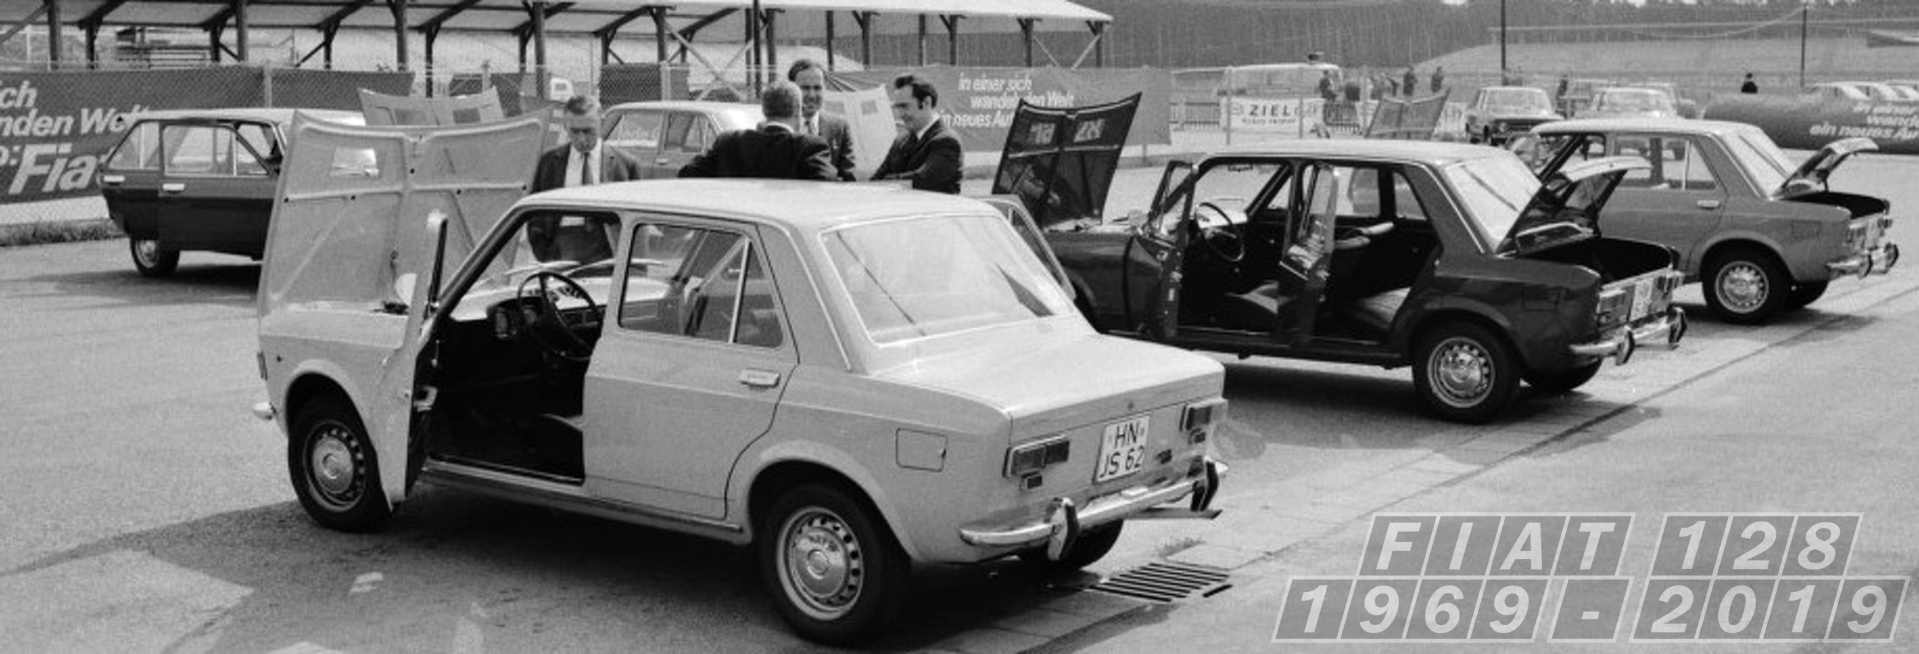 1969_08_28_CarsParkedatHockenheim_2-2_vz.jpg